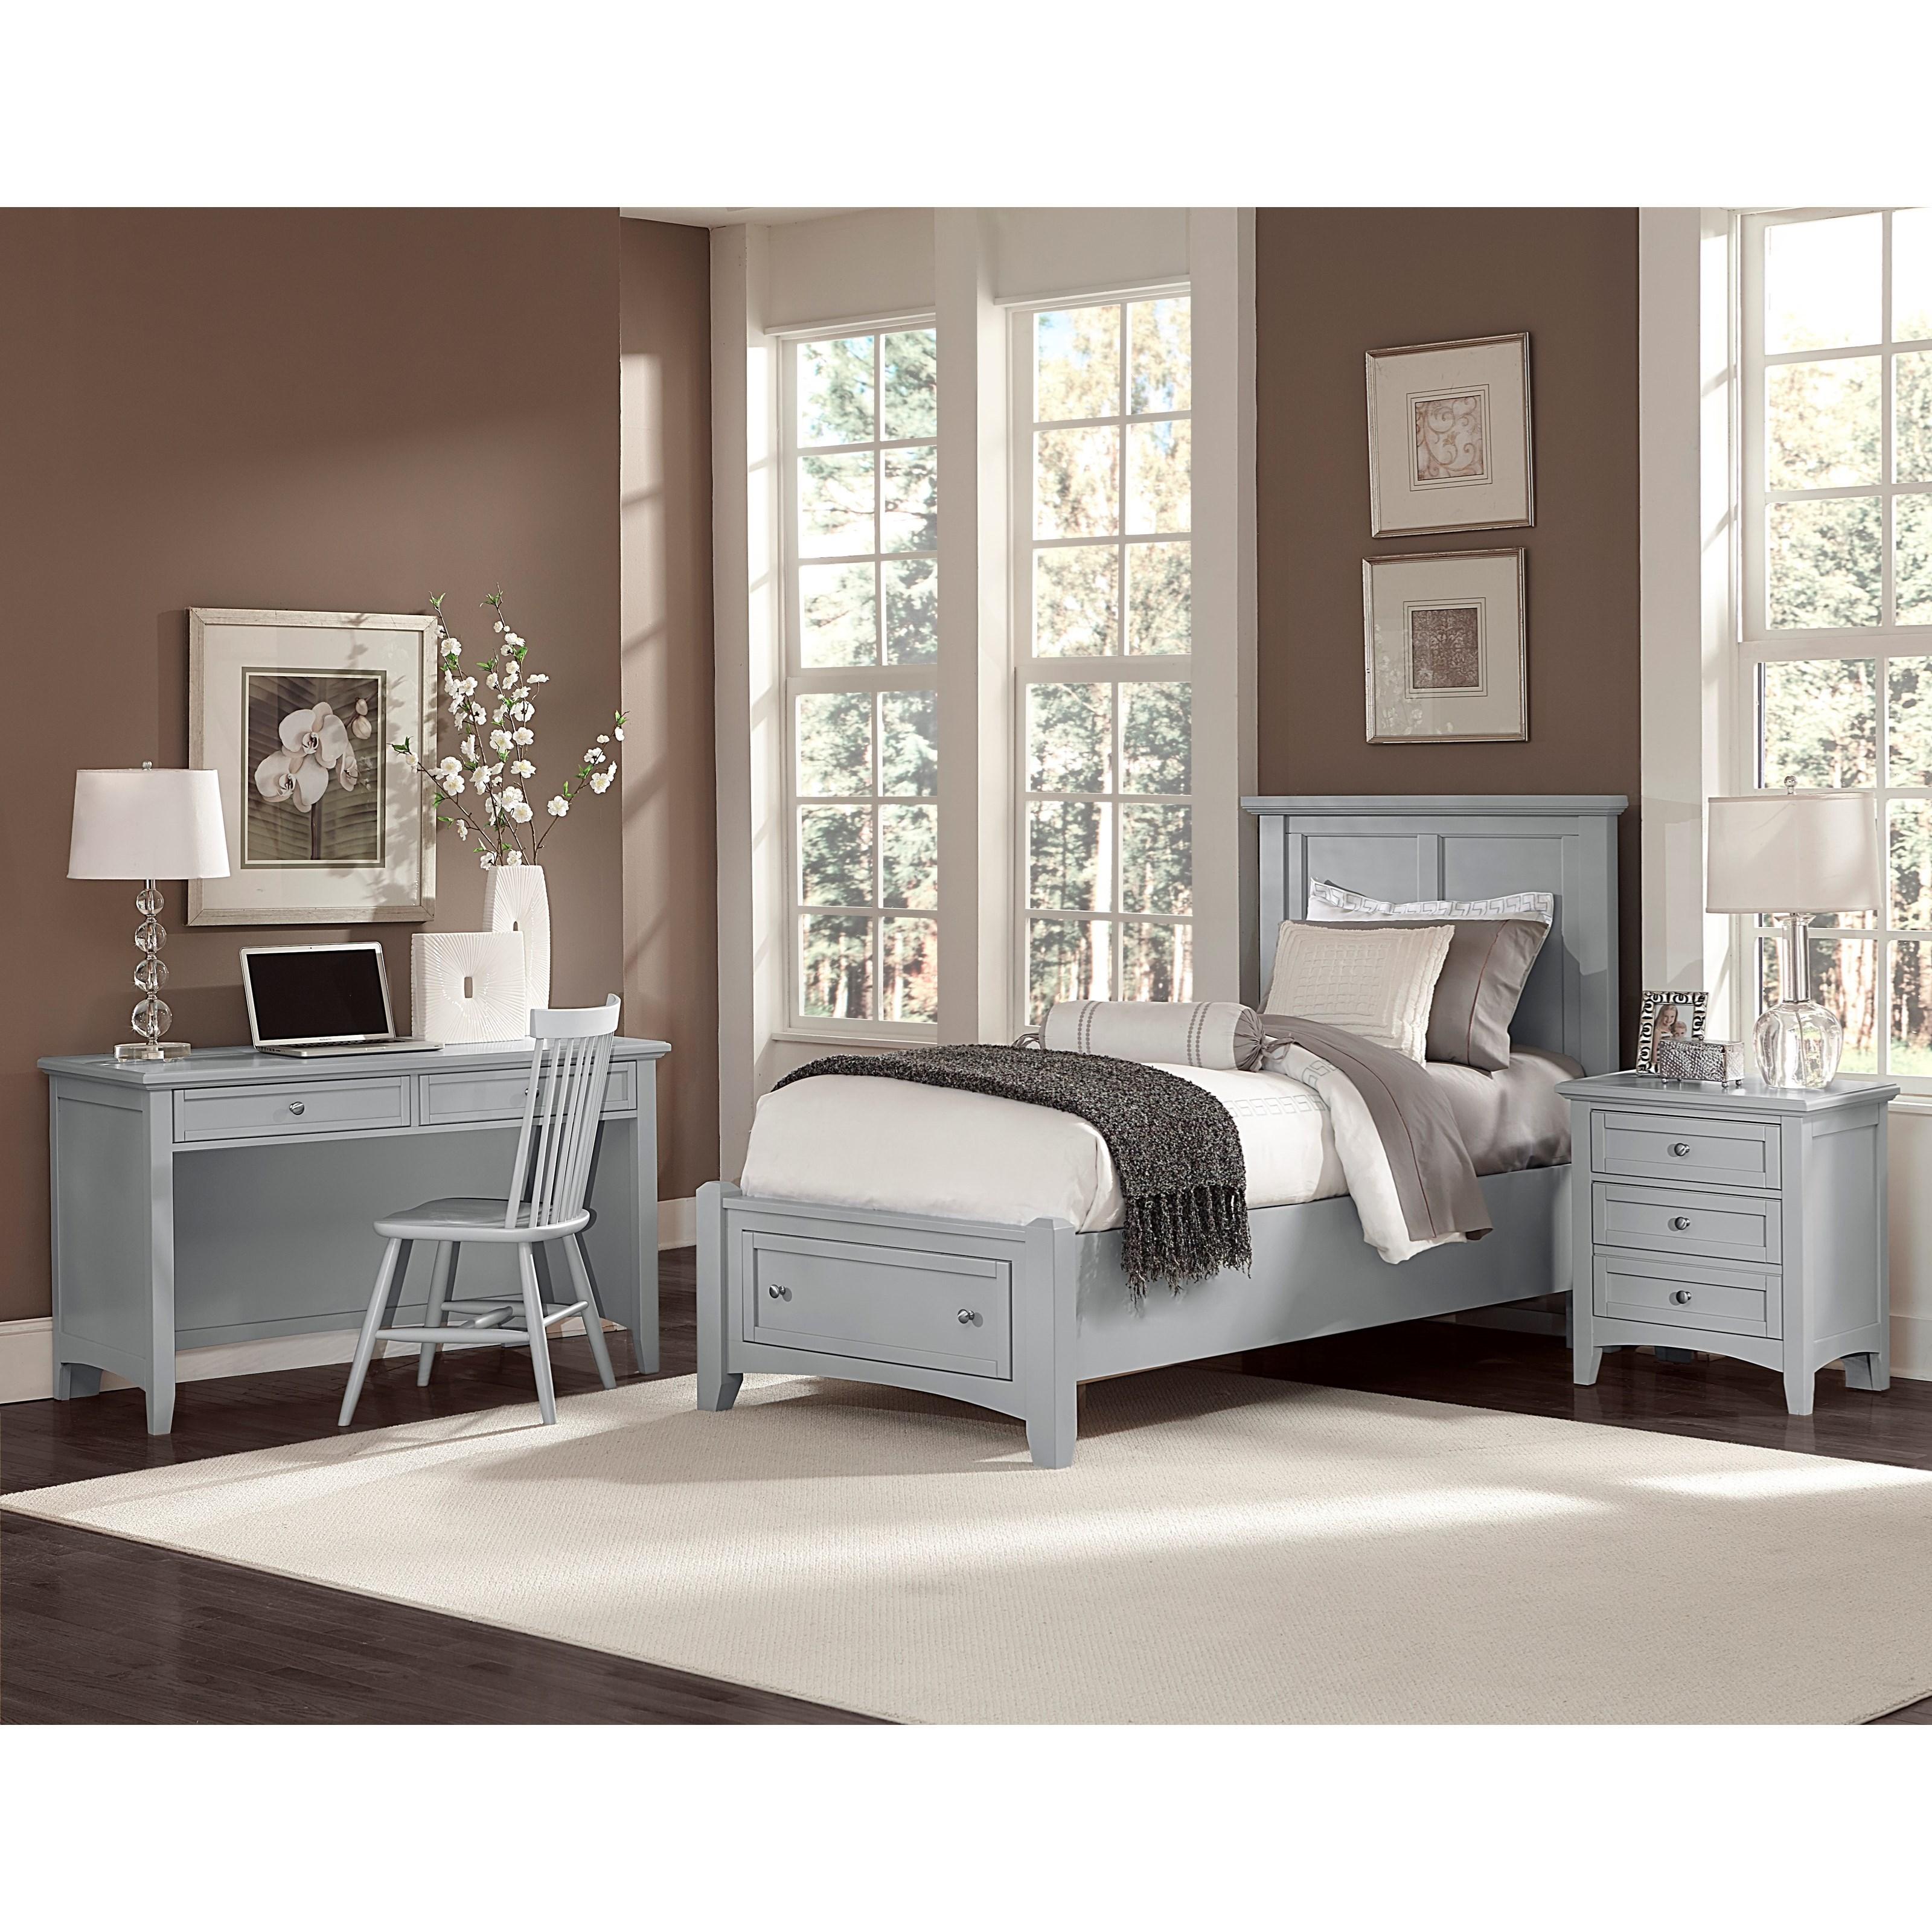 Bassett Home Furnishings: Vaughan Bassett Bonanza Twin Mansion Storage Bed With 1